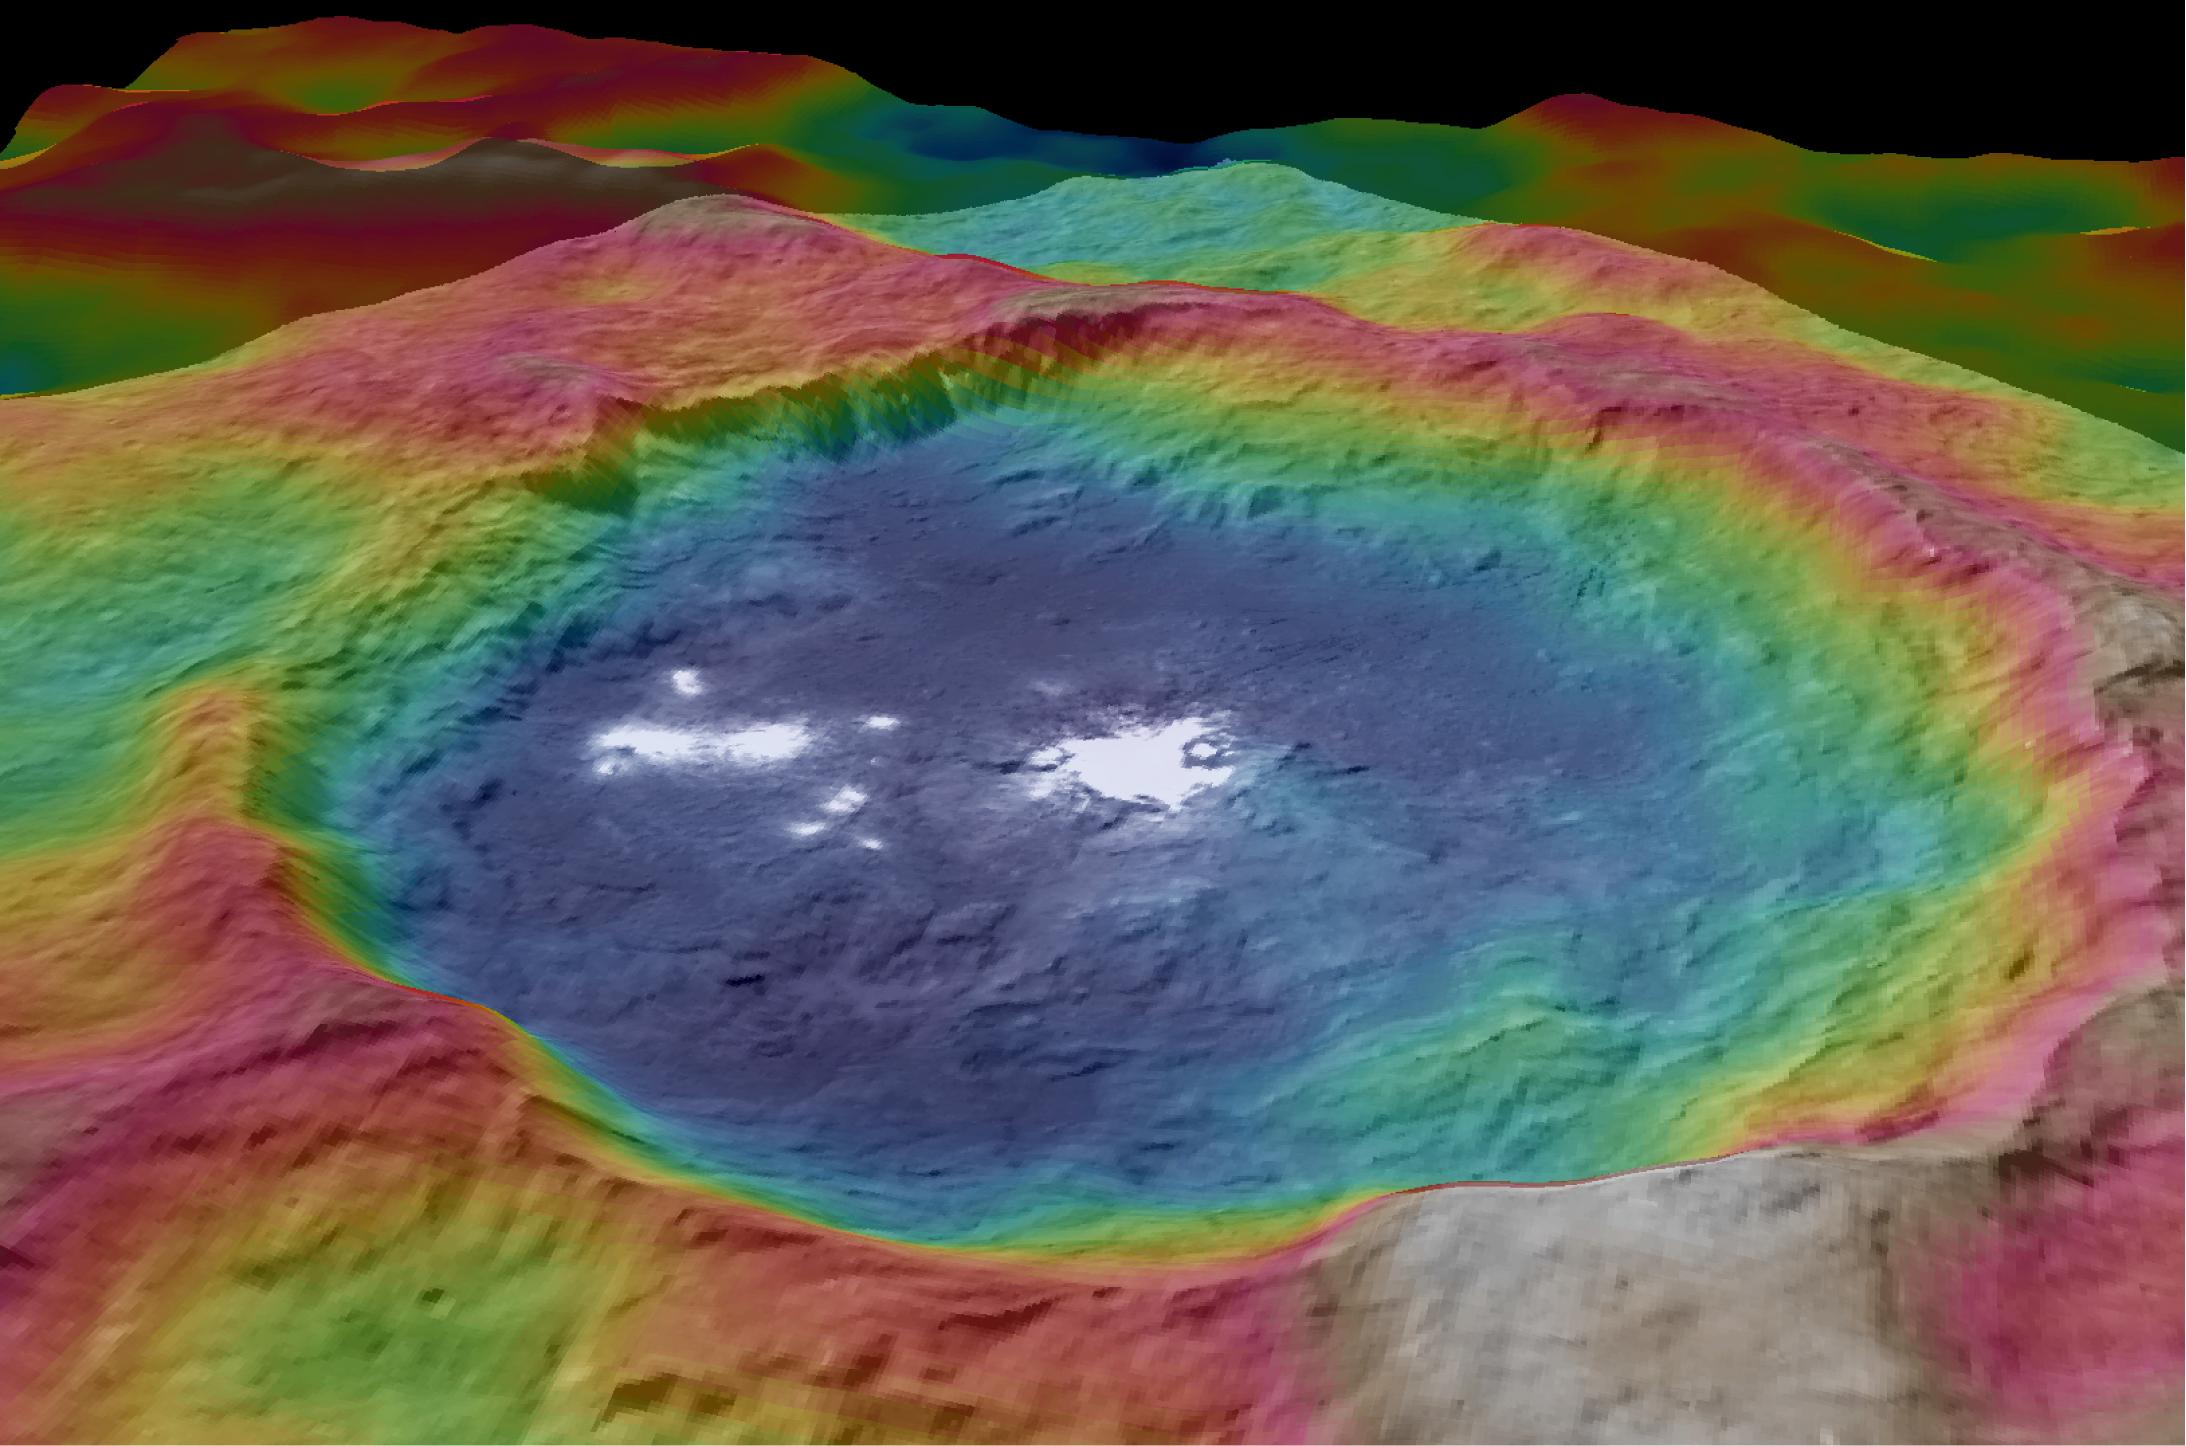 Кратеры и белые пятна Церере. Фото: NASA